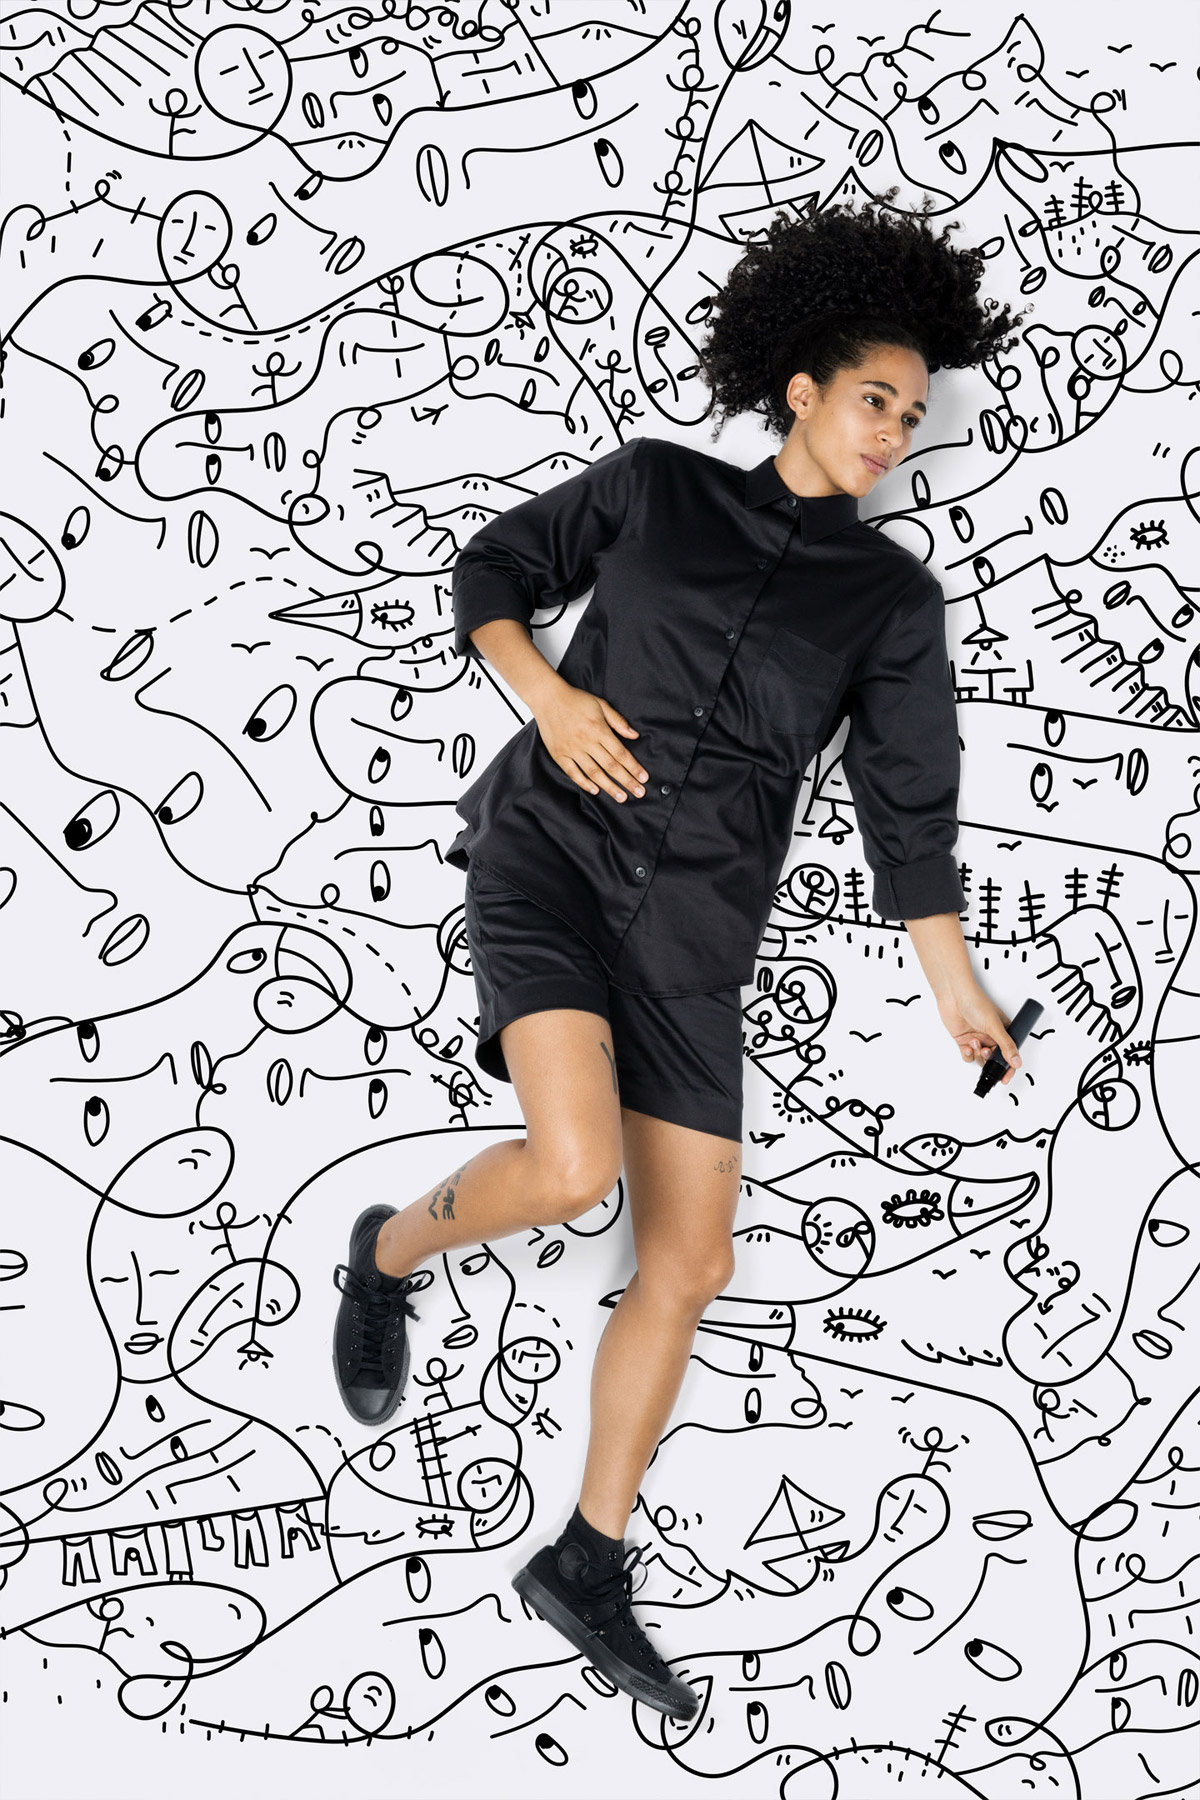 Artist Shantell Martin drawings